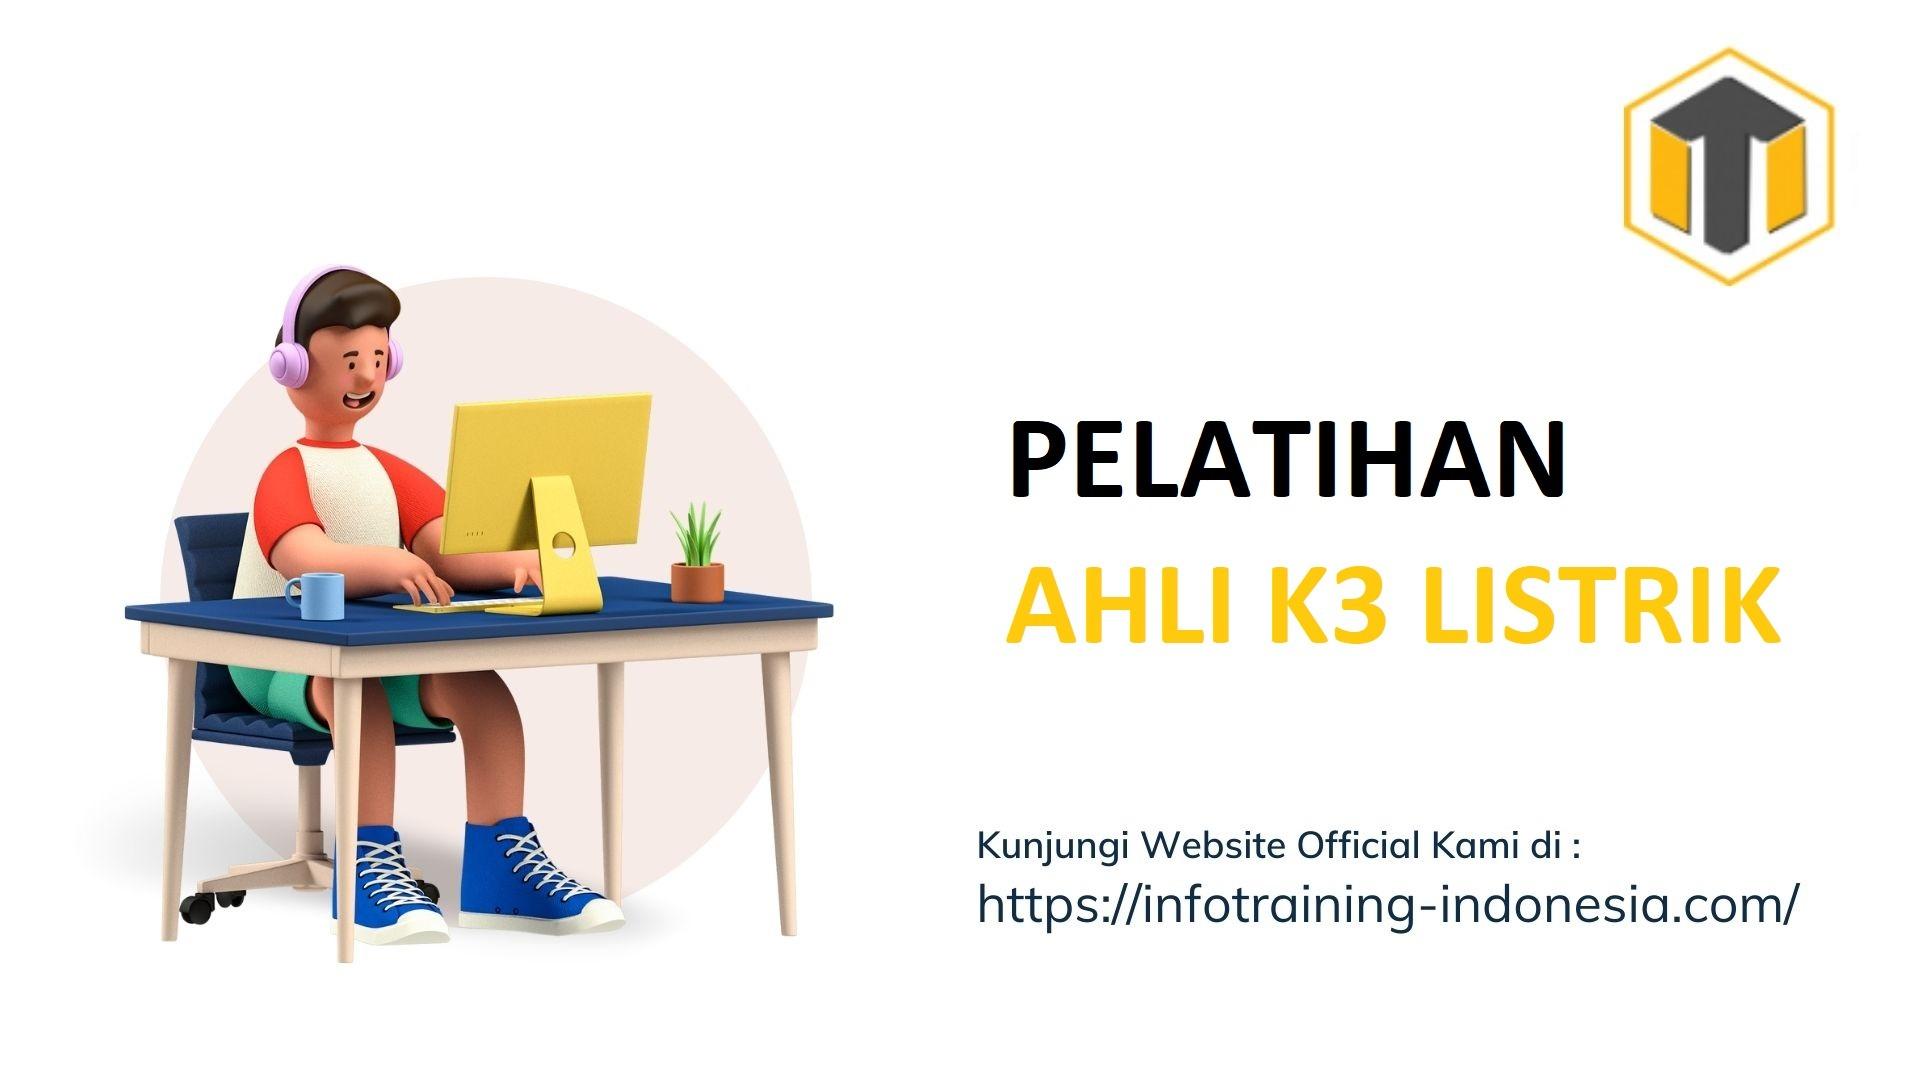 PELATIHAN AHLI K3 LISTRIK Training Sertifikat